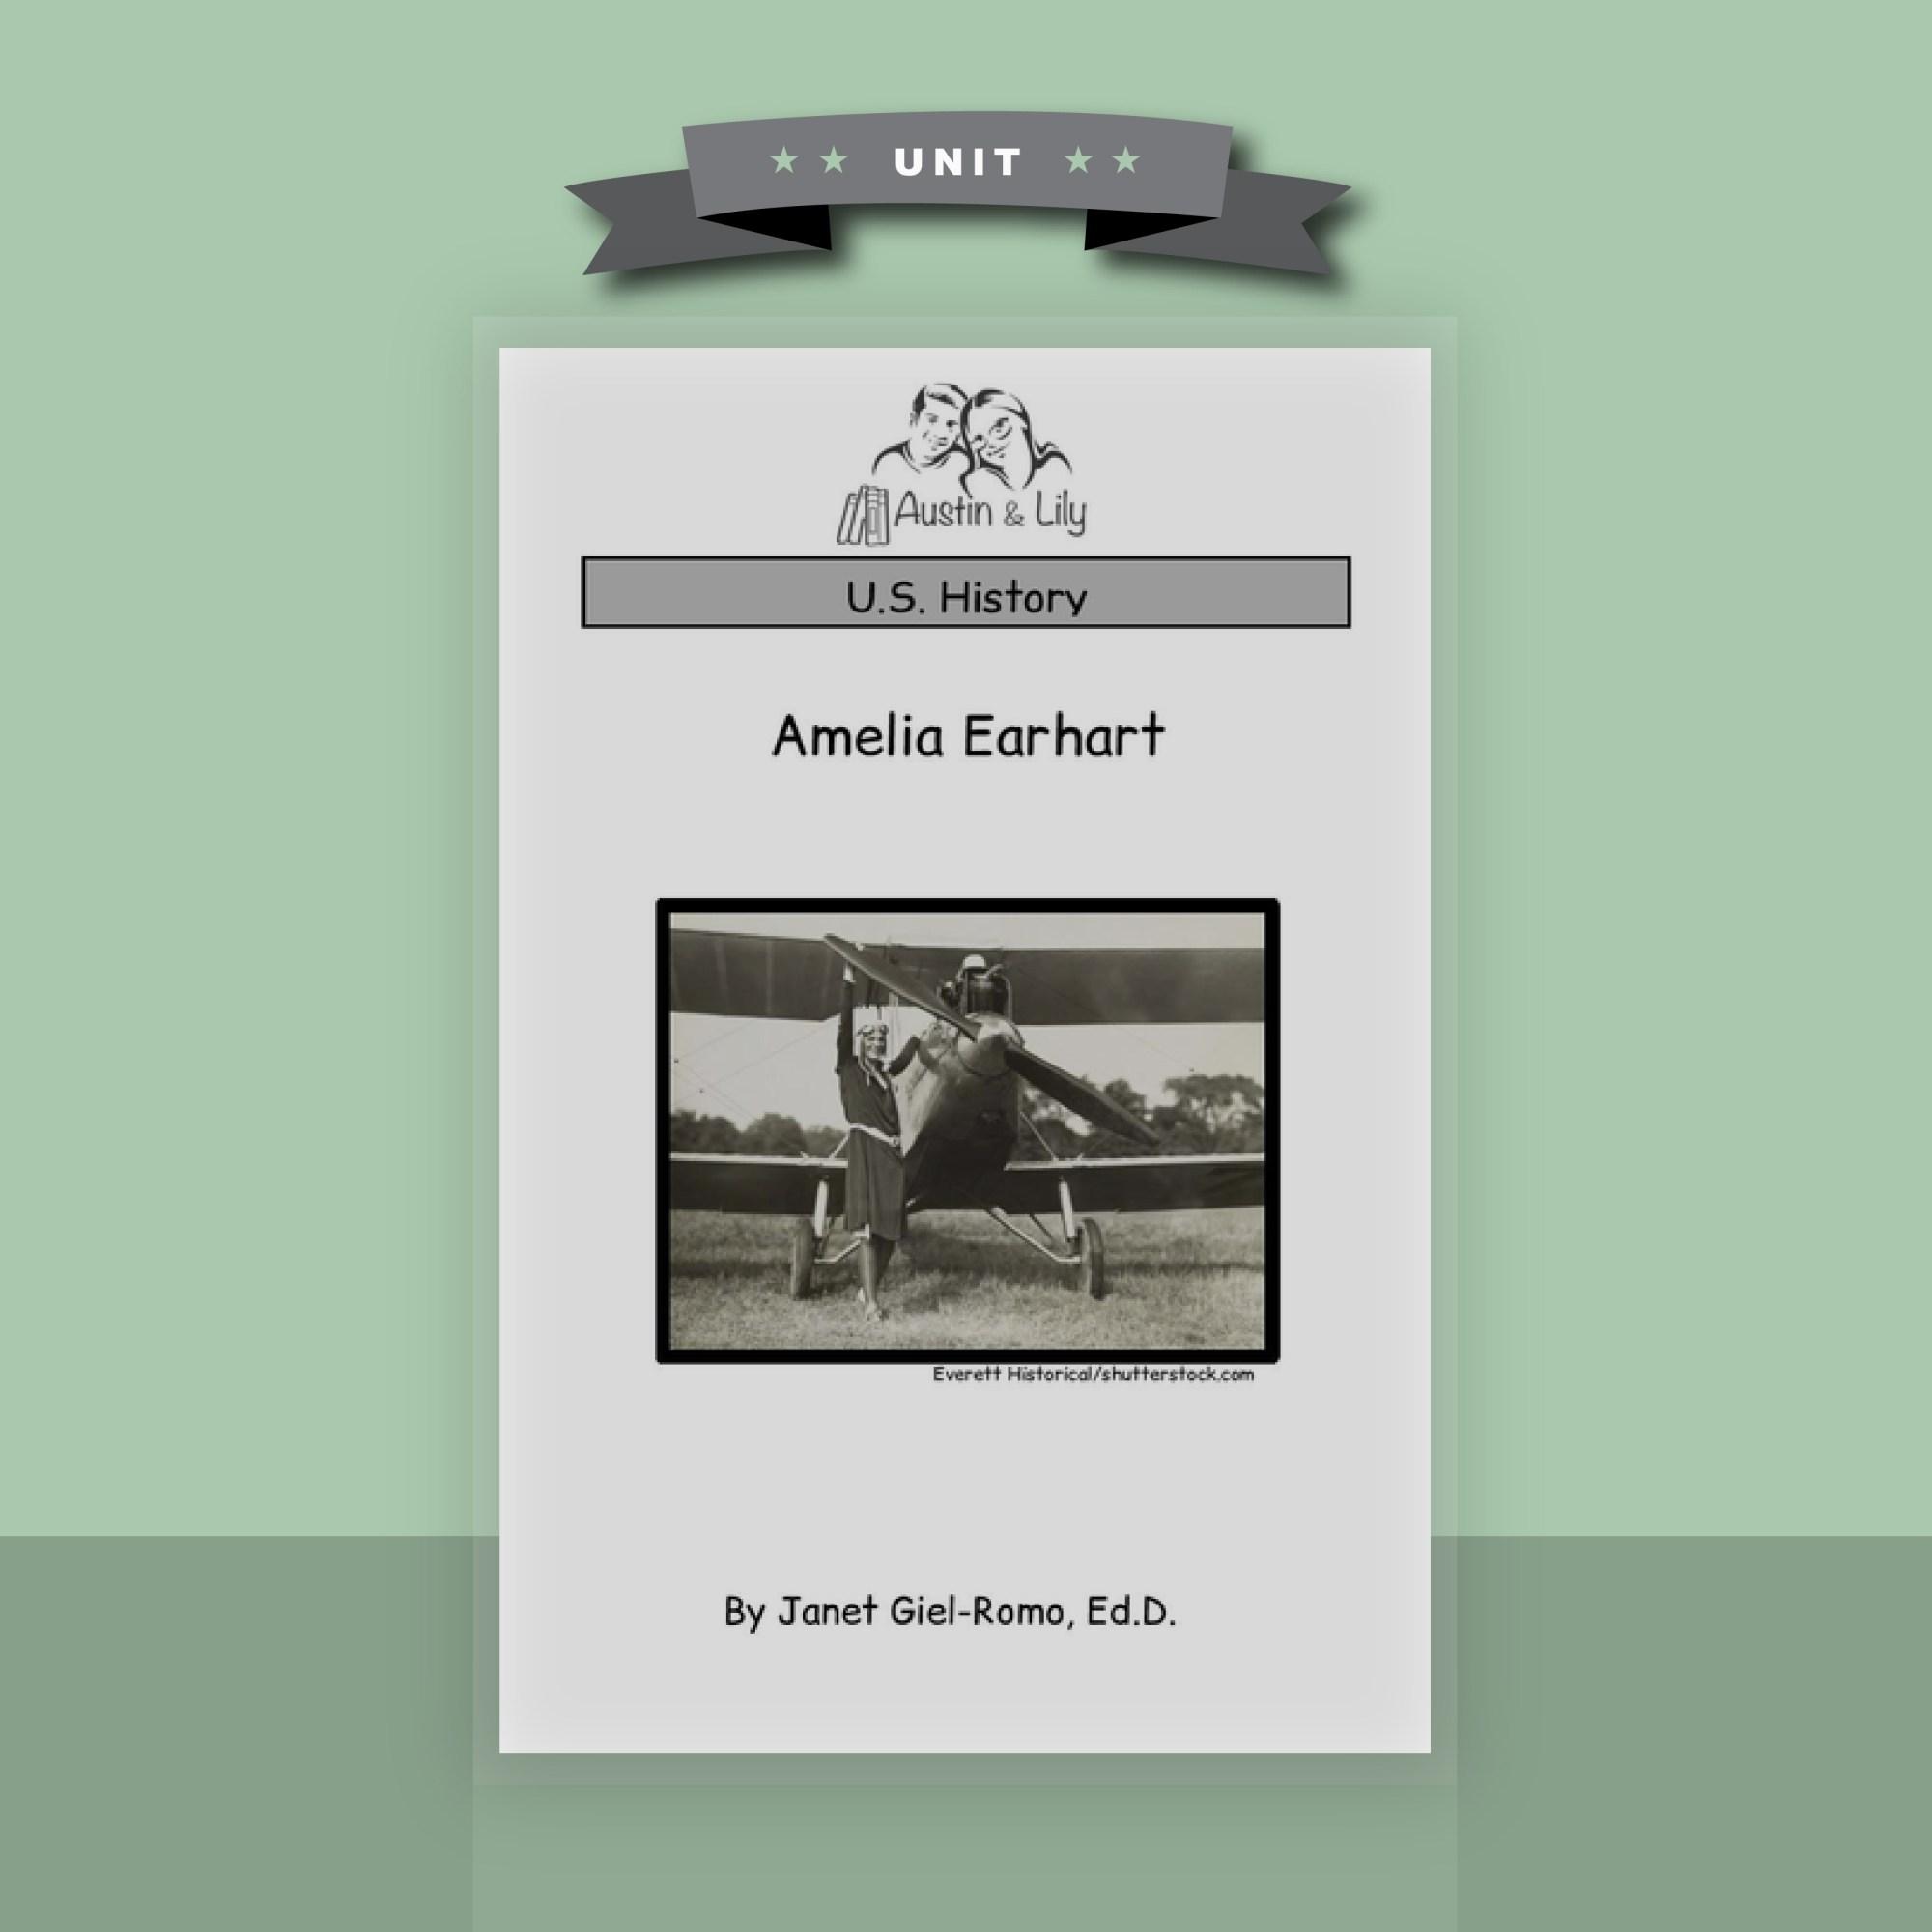 hight resolution of Amelia Earhart Biography - Austin \u0026 Lily